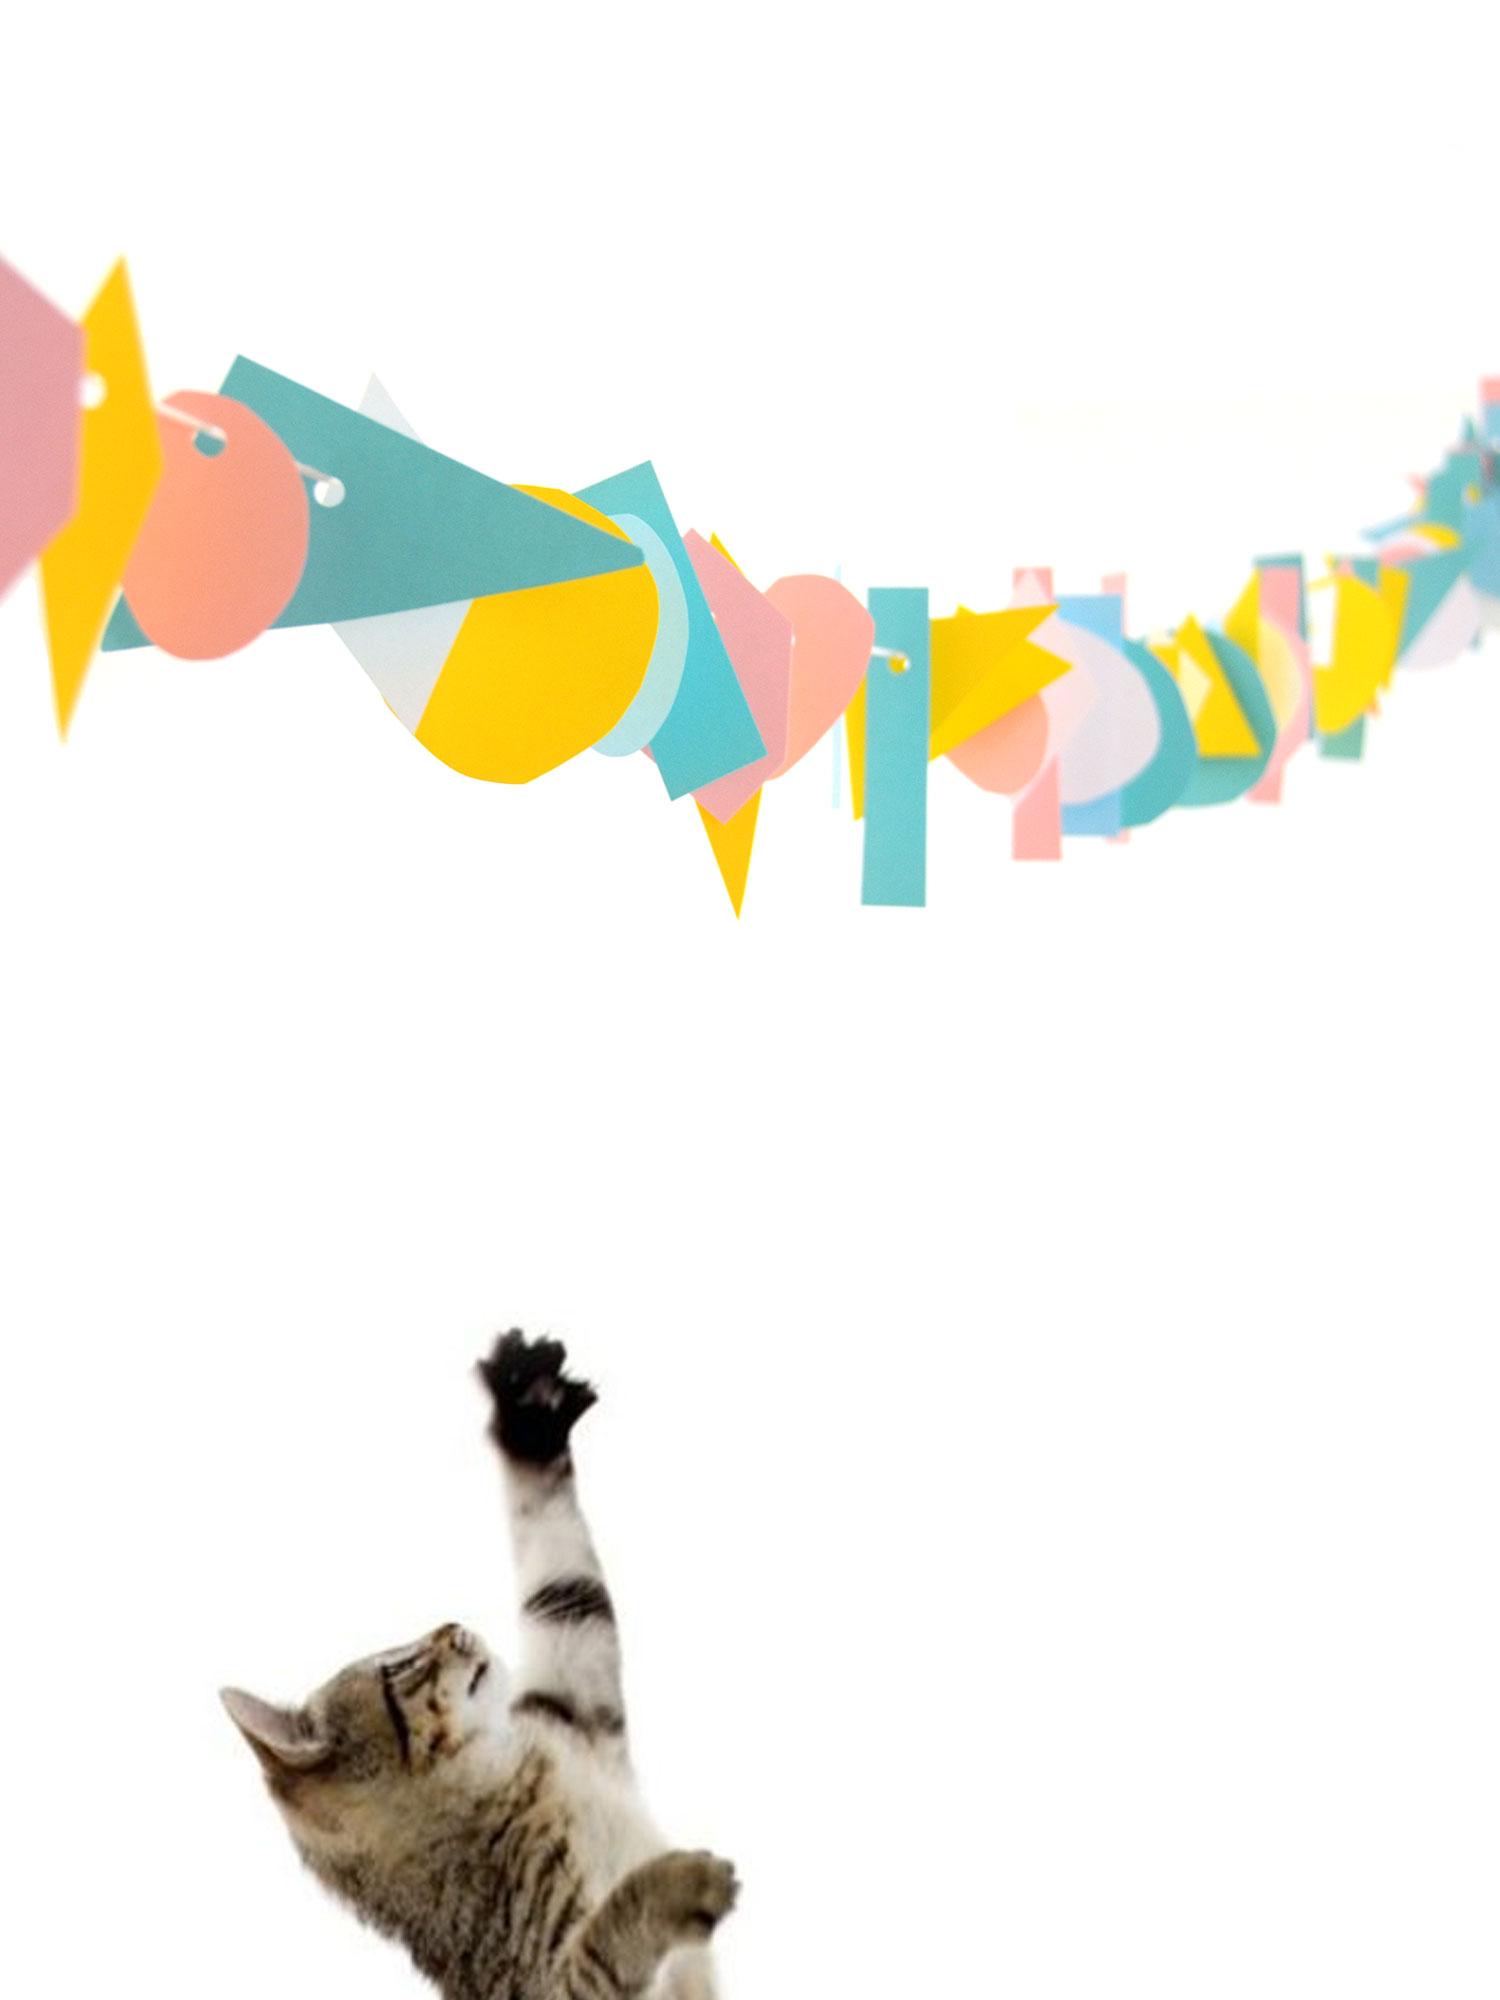 Stefani_Greenwood_Party_Streamer_Kitty.jpg